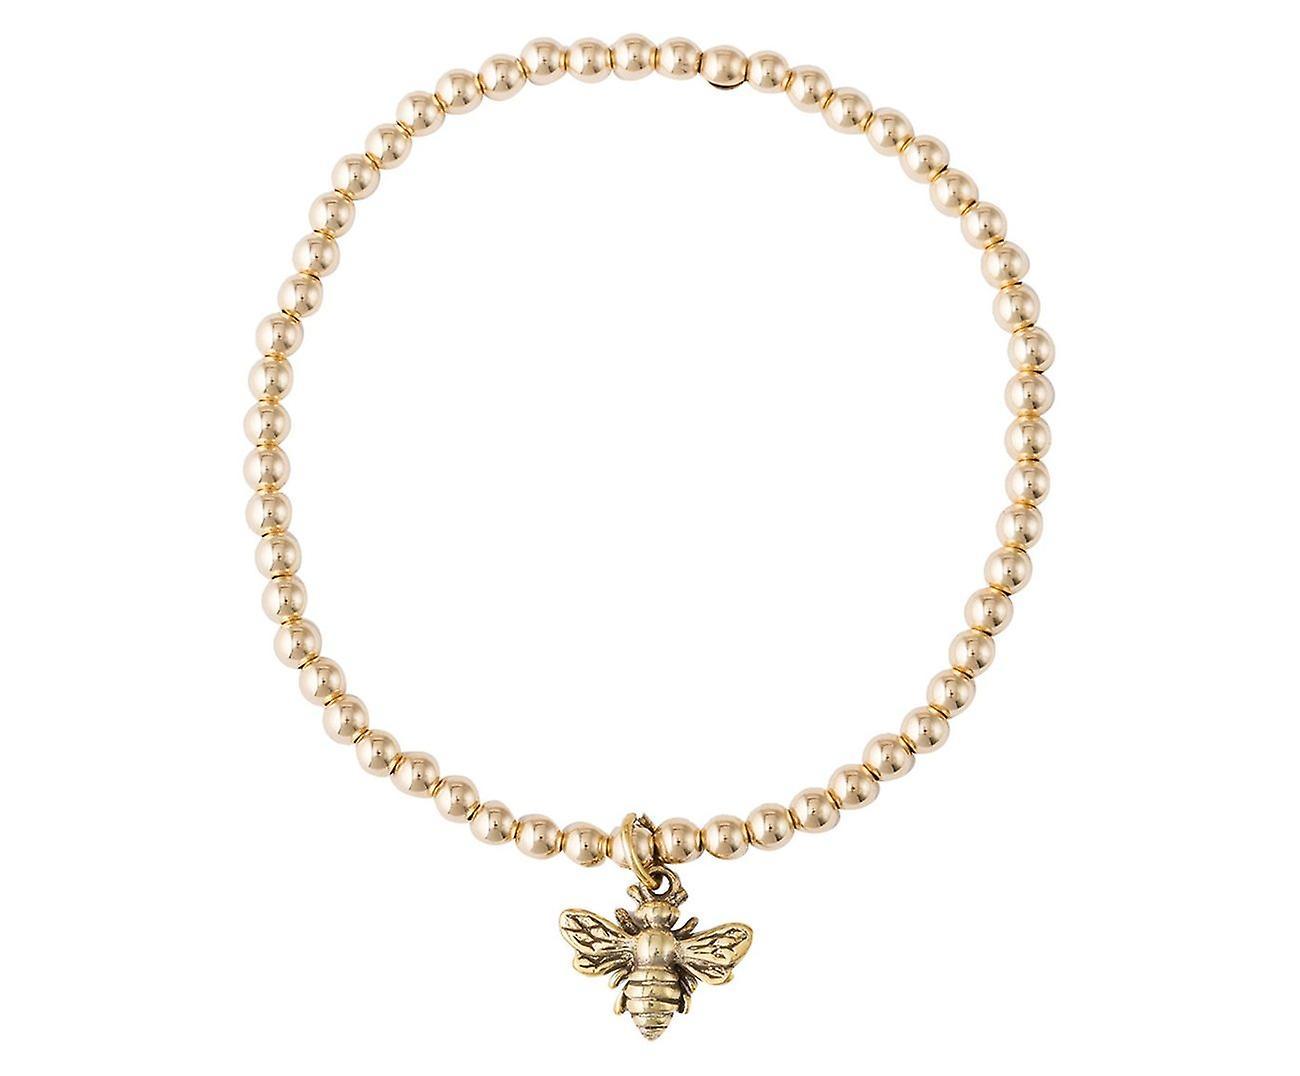 GEMSHINE Damen oder Mädchenarmband BIENE in 925 Silber, vergoldet oder rose